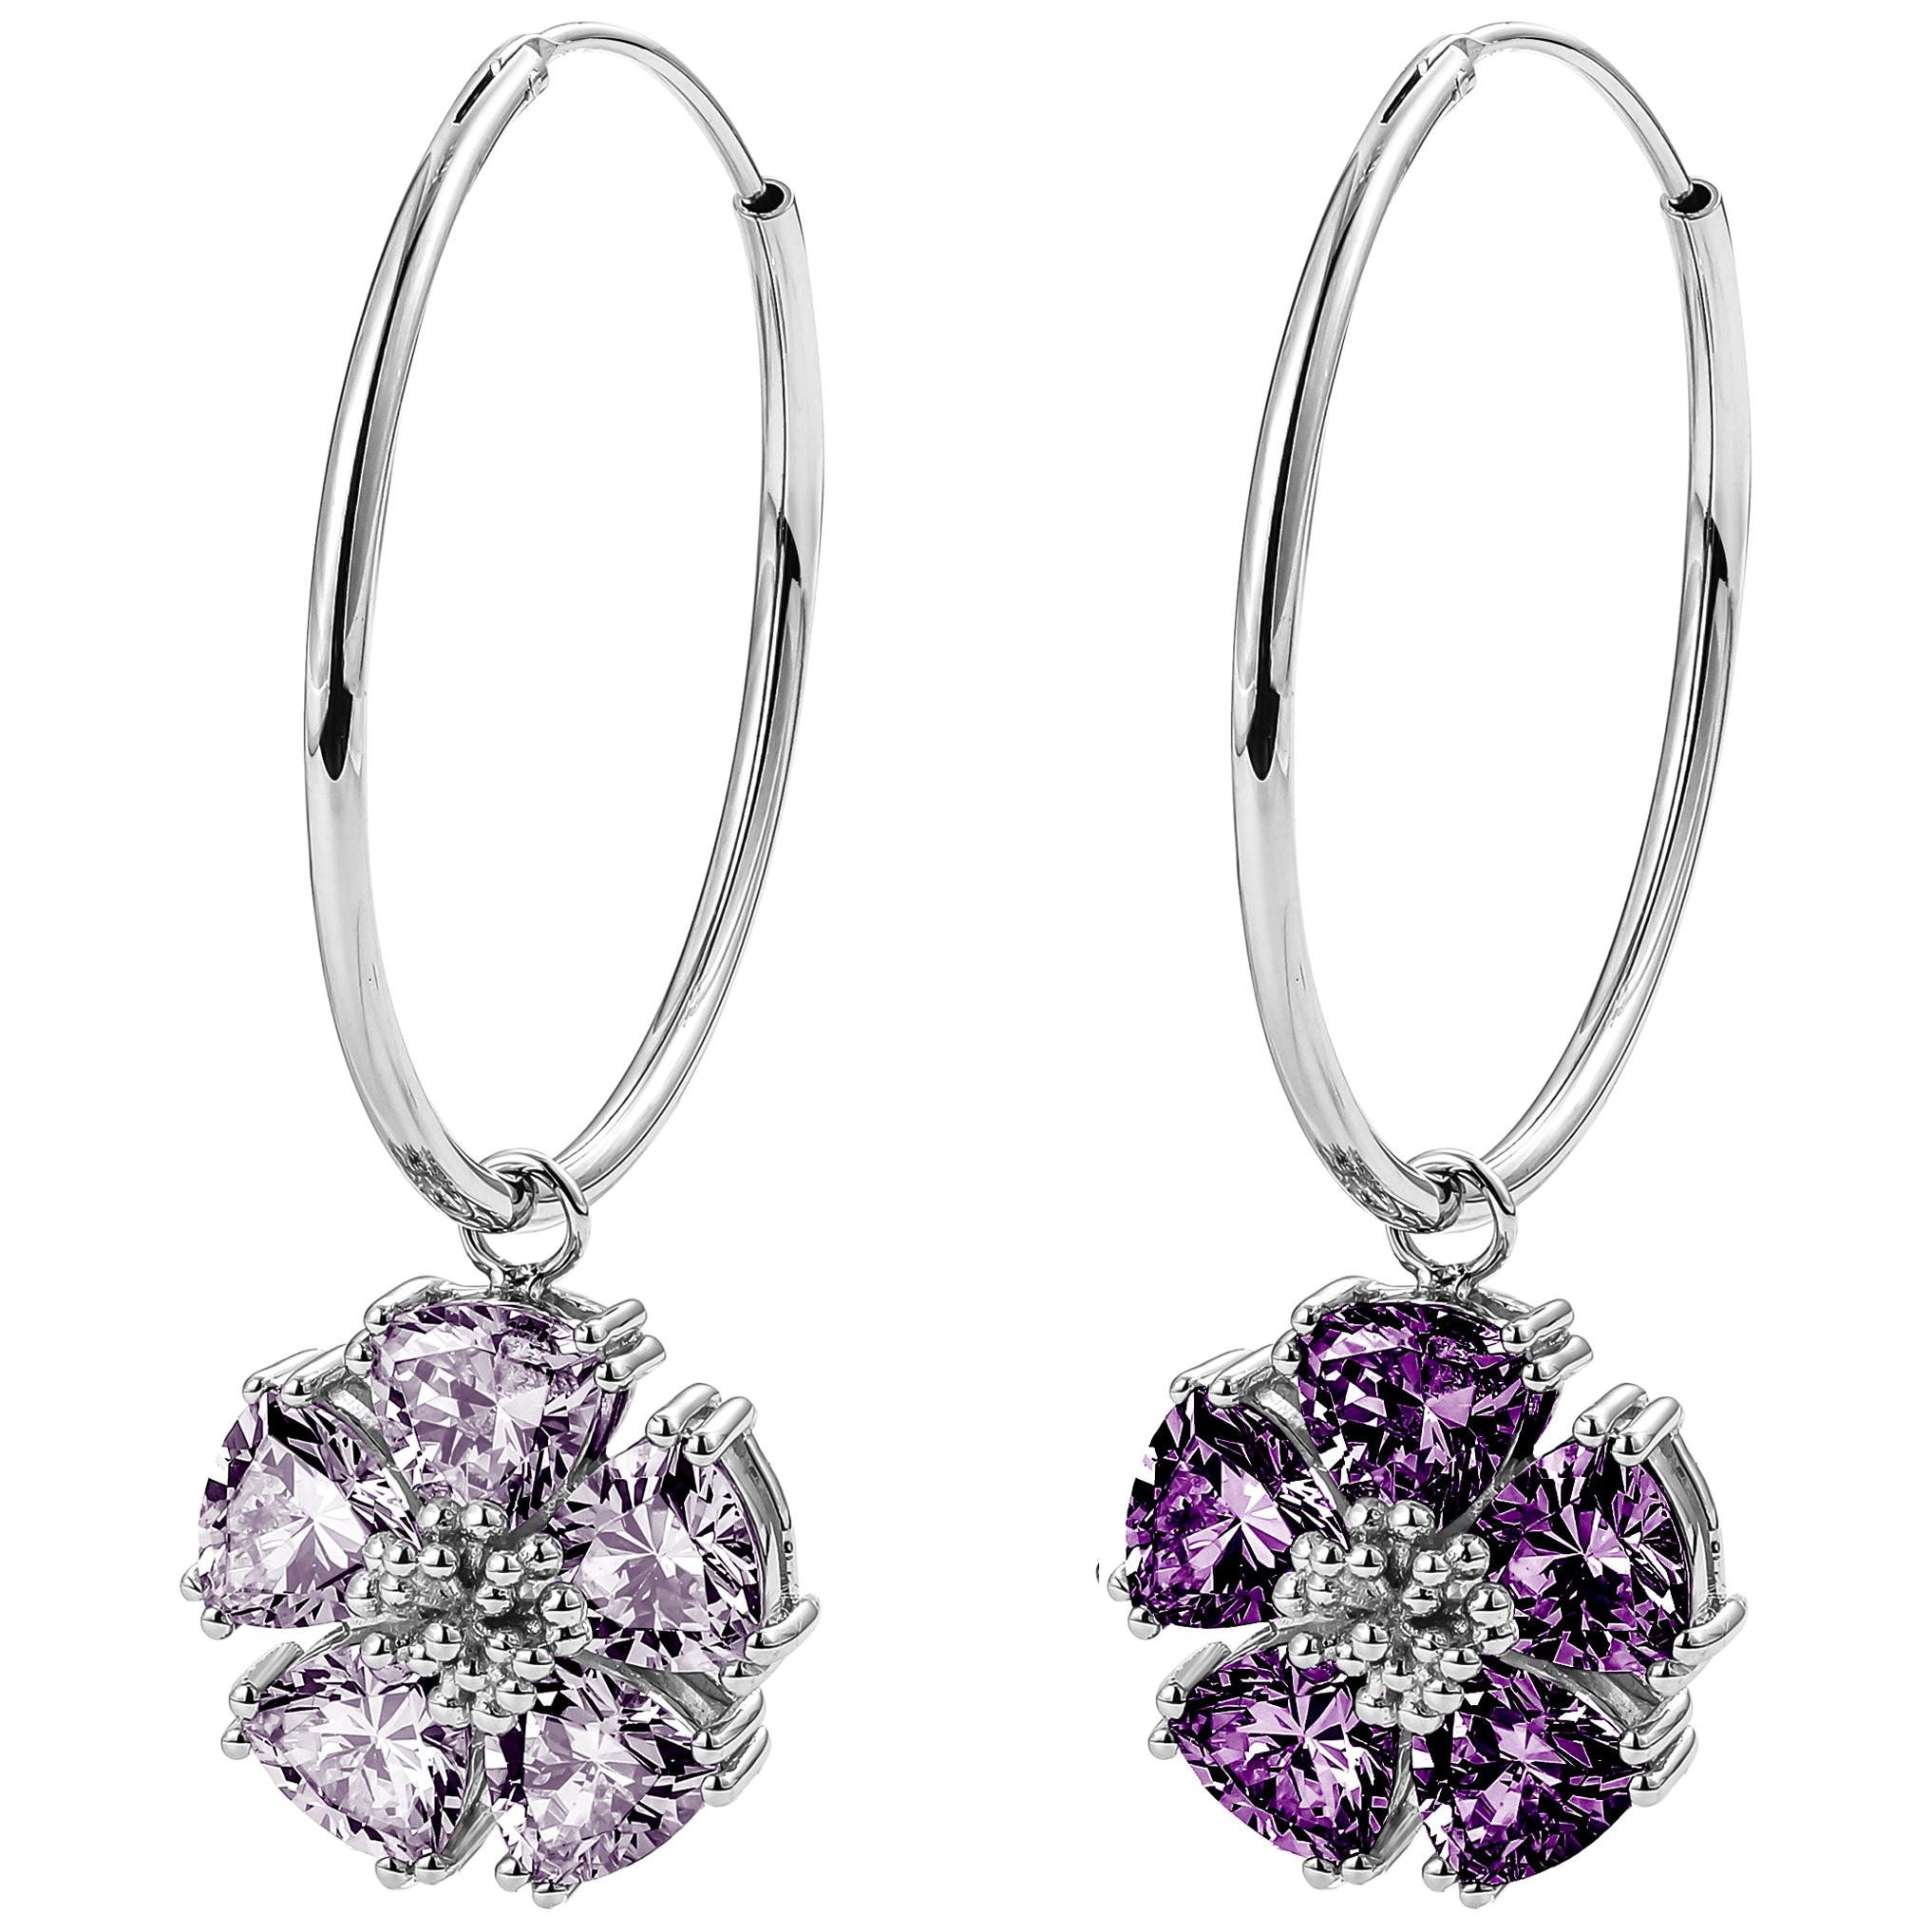 Amethyst and Lavender Amethyst Medium Mismatched Blossom Gemstone Hoops